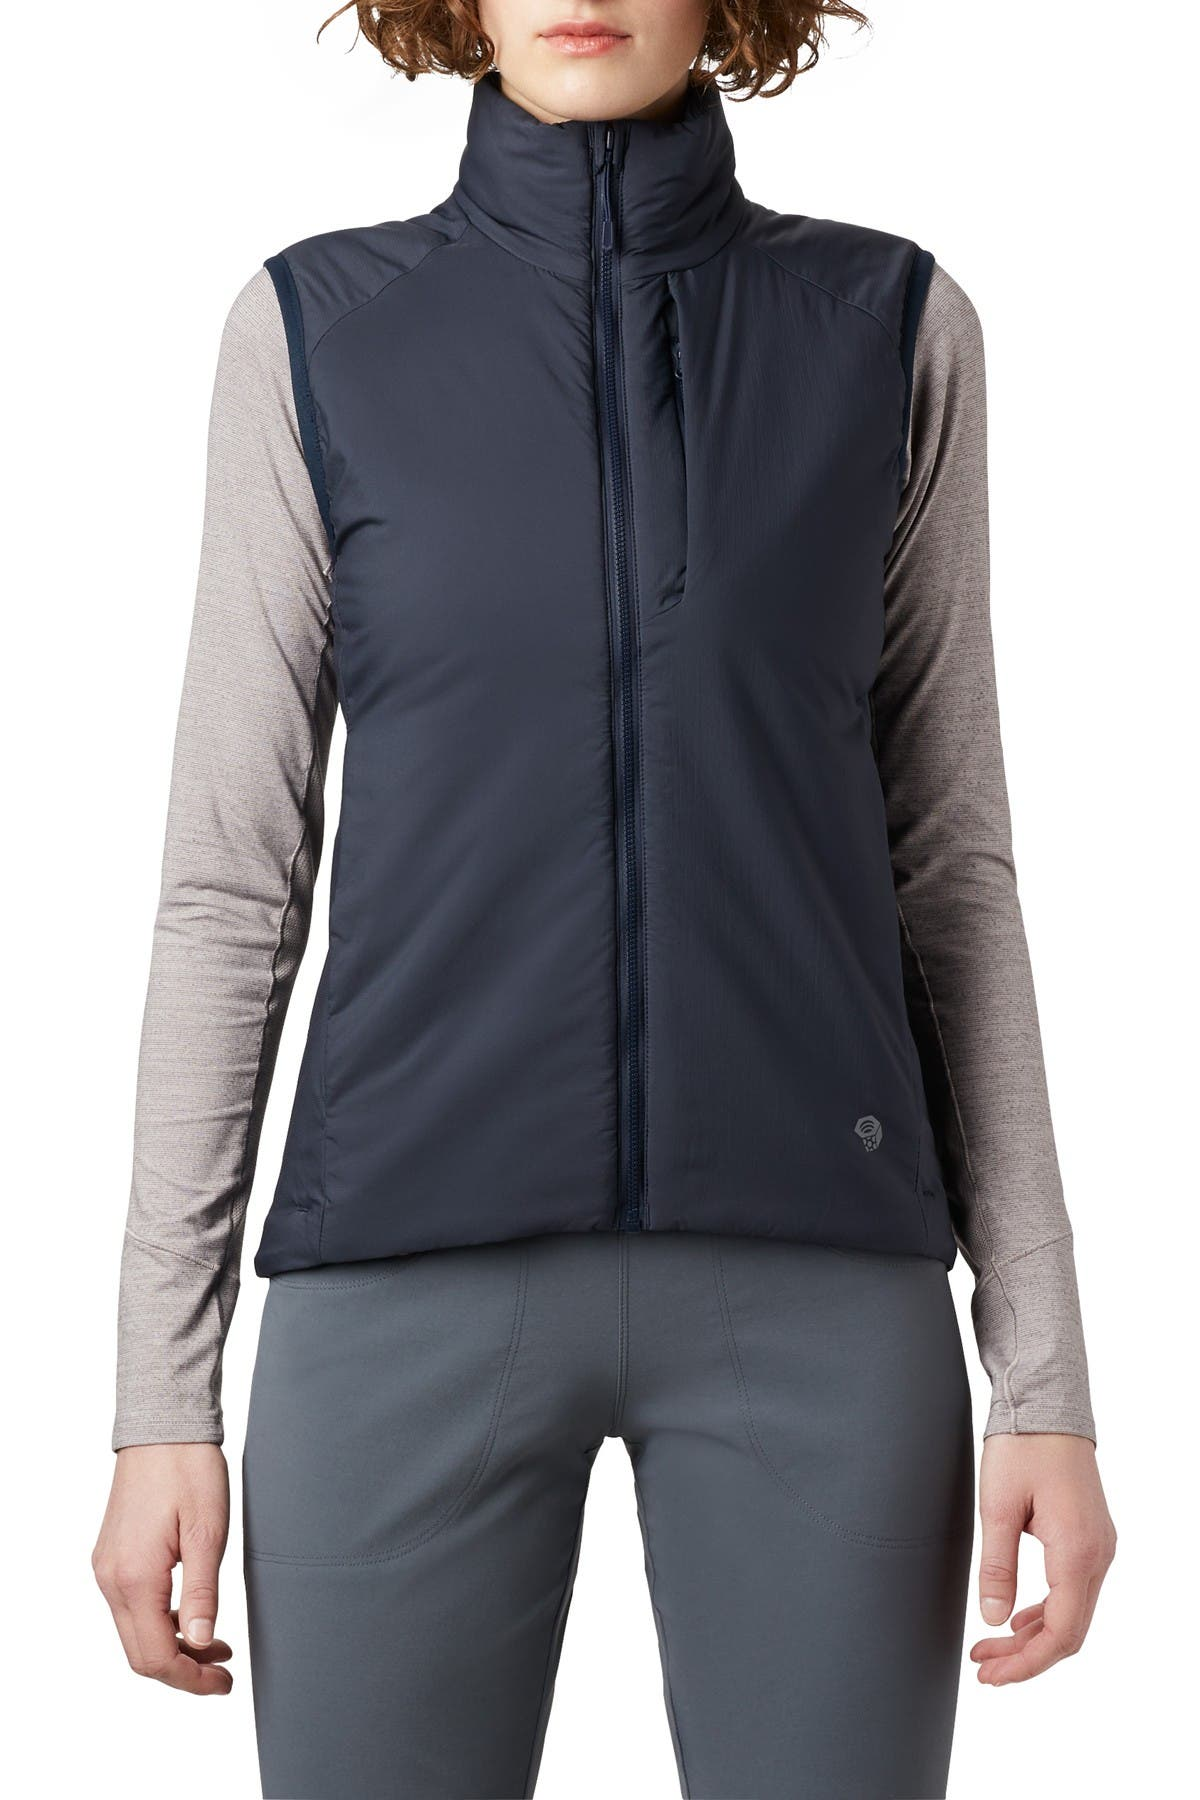 Image of MOUNTAIN HARDWEAR Kor Strata™ Vest